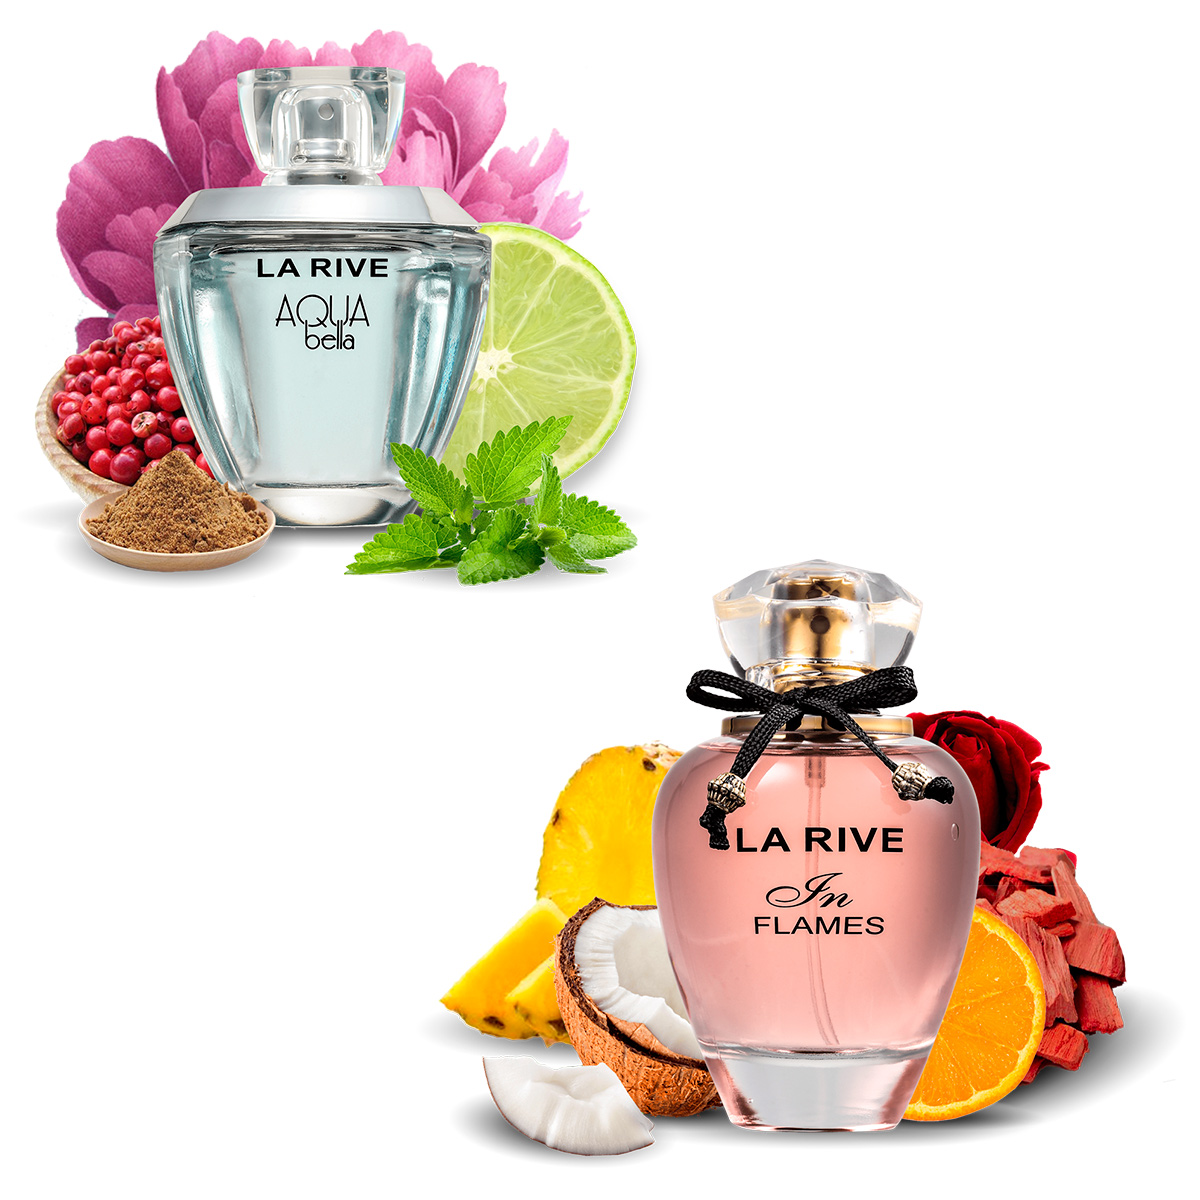 Kit 2  Perfumes La Rive In Flames 90ml + Aqua Bella 100ml